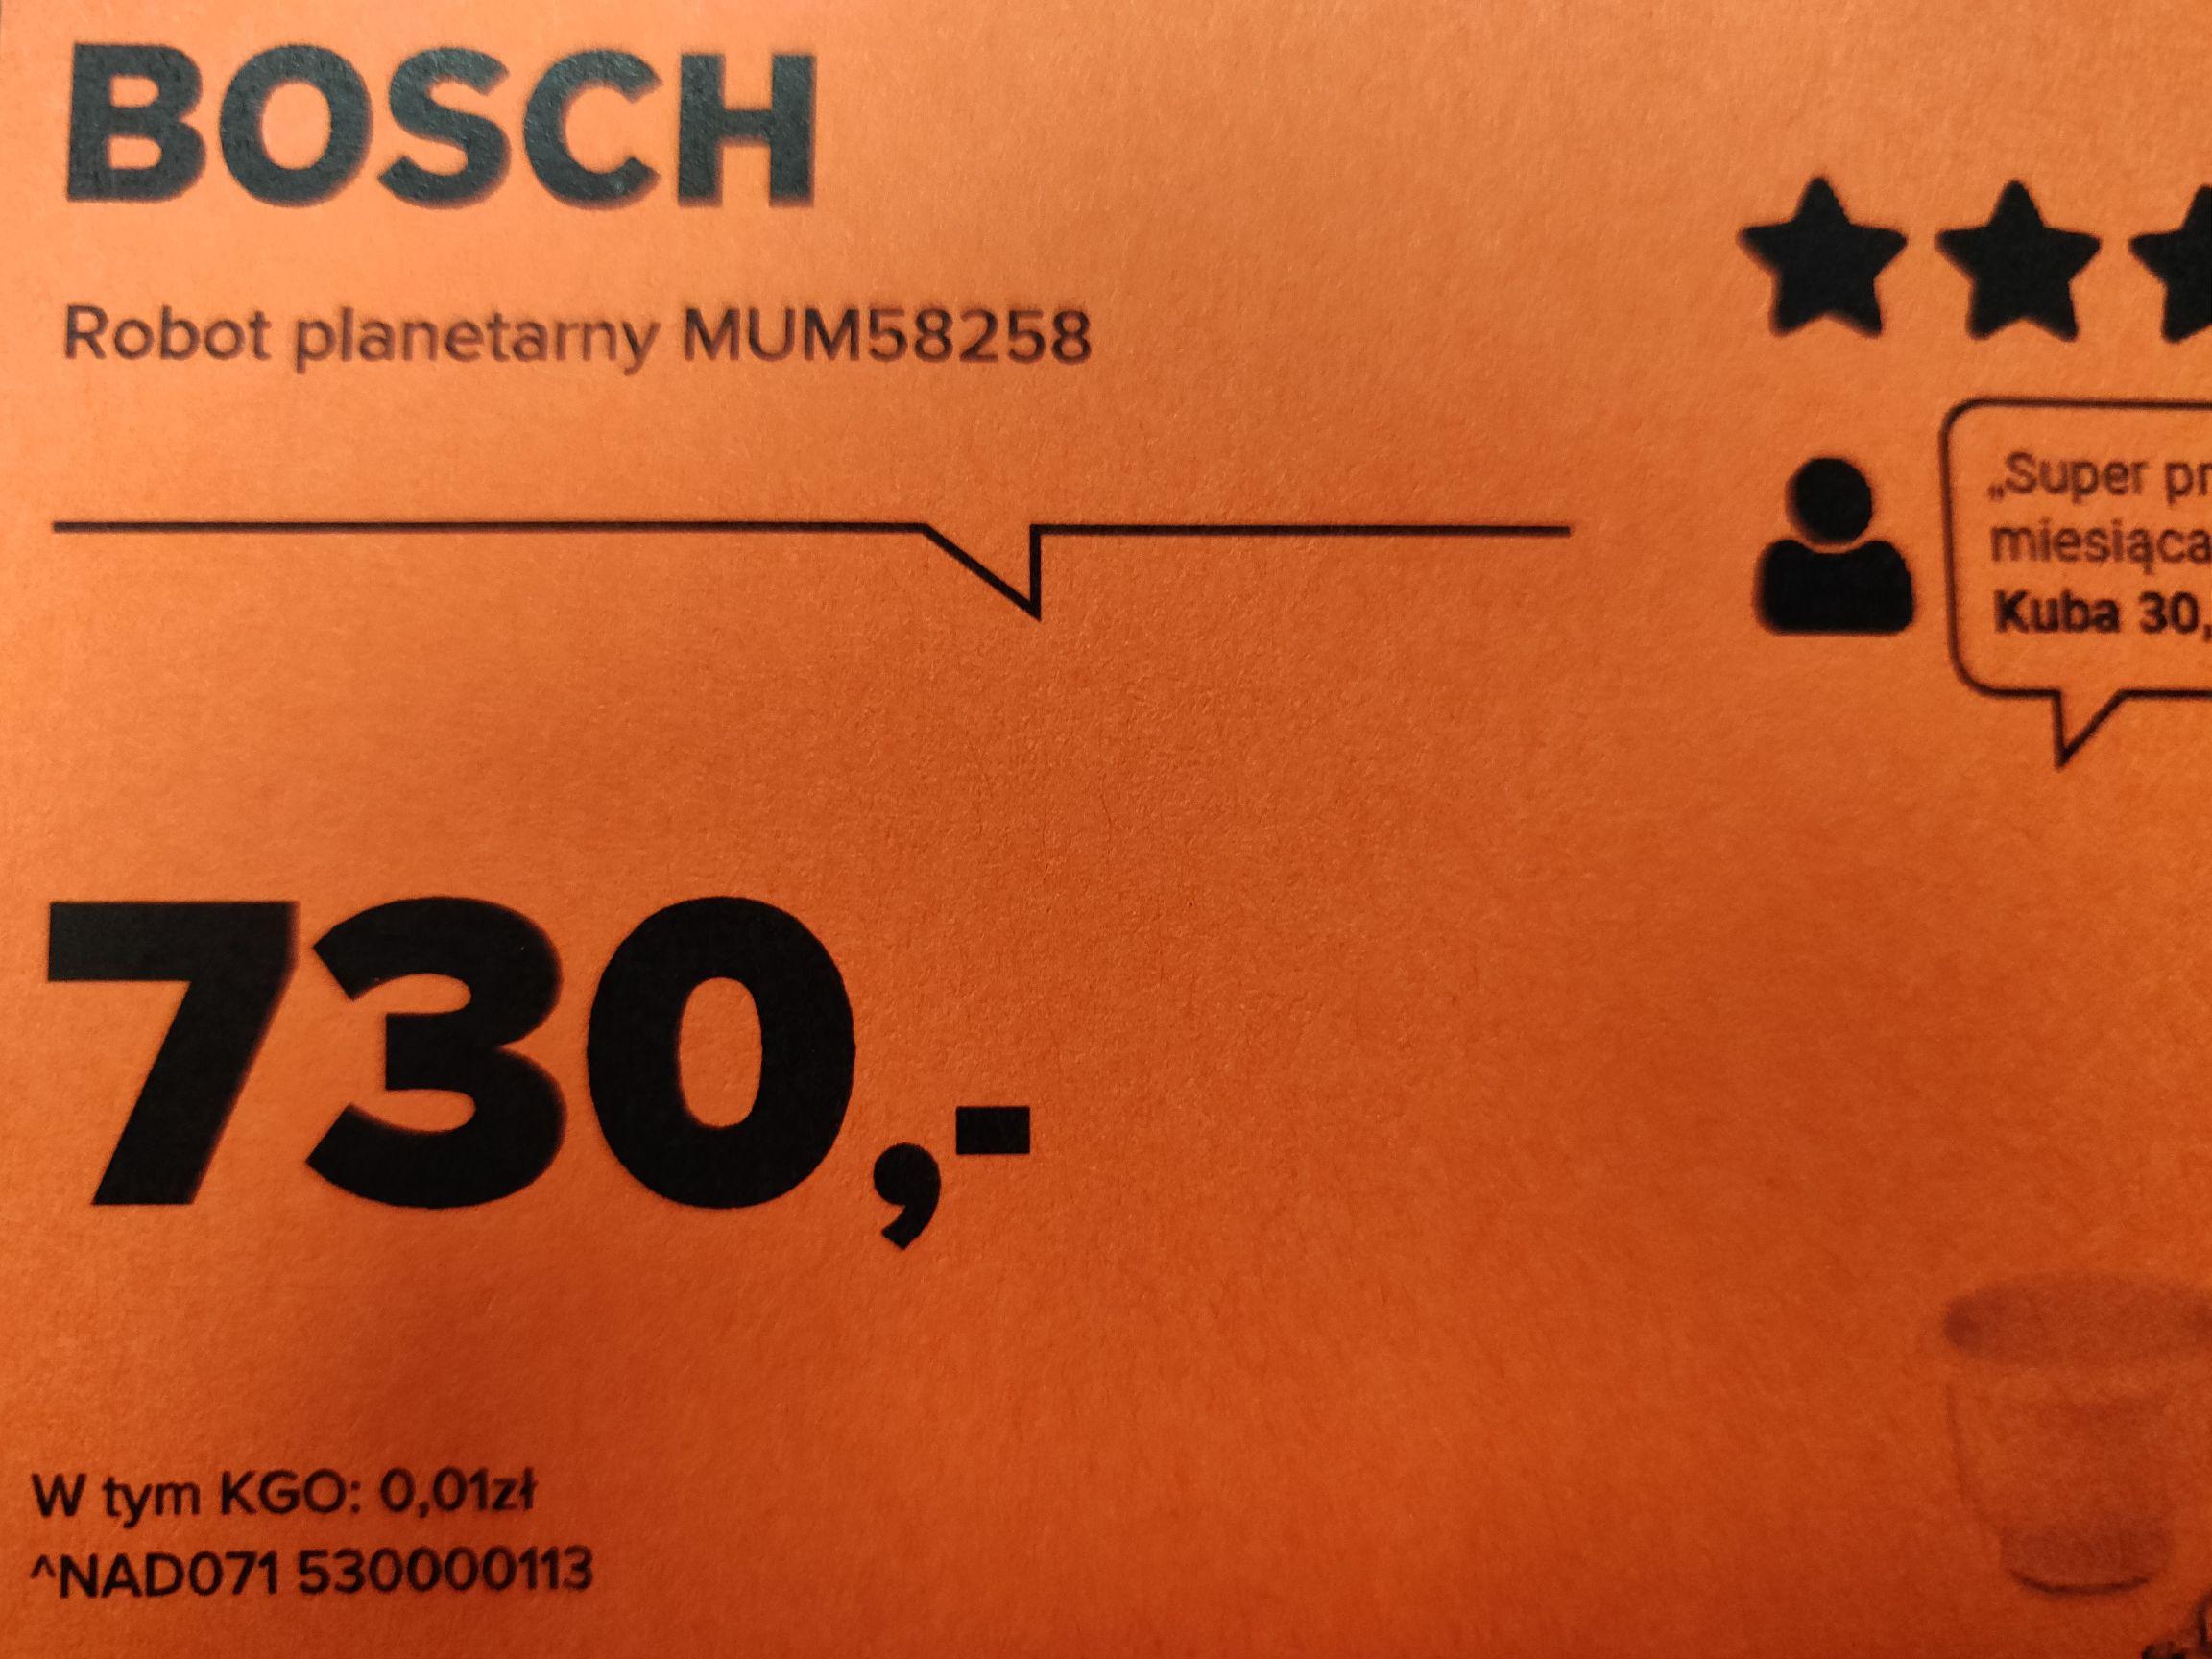 Robot planetarny Bosch Mum58258 w Neonet